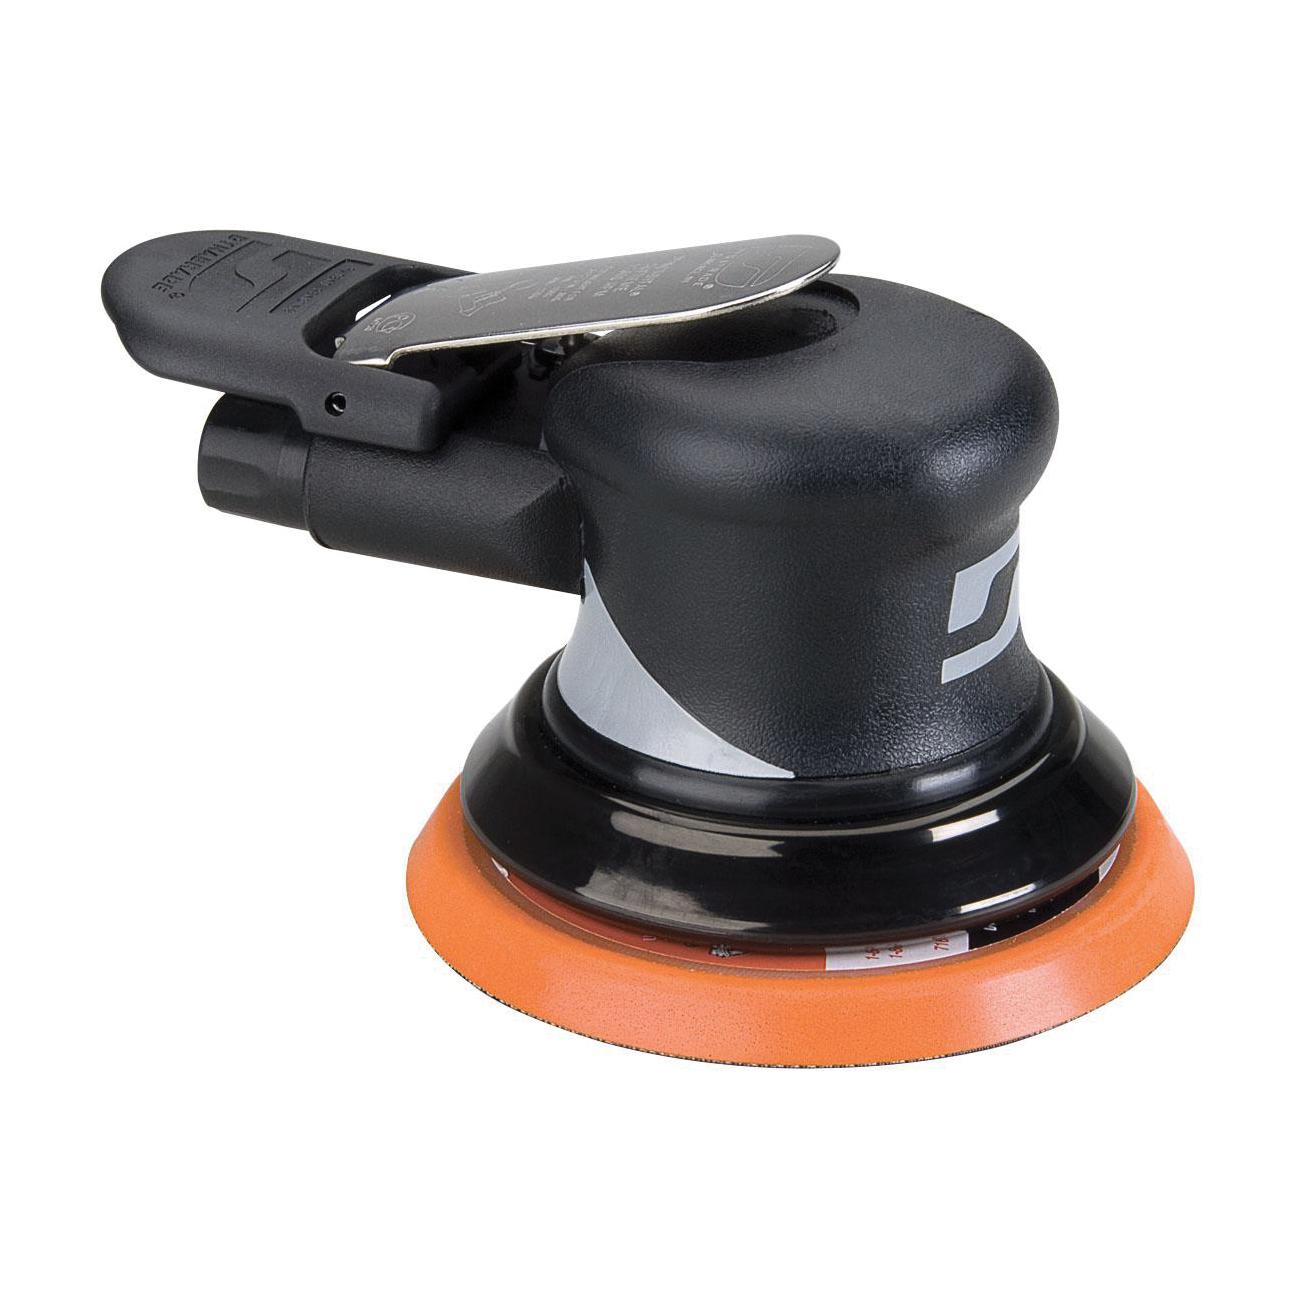 Dynabrade® Dynorbital® Supreme 56815 Non-Vacuum Palm Style Random Orbital Sander, 5 in Round Pad, 18 scfm Air Flow, 90 psi